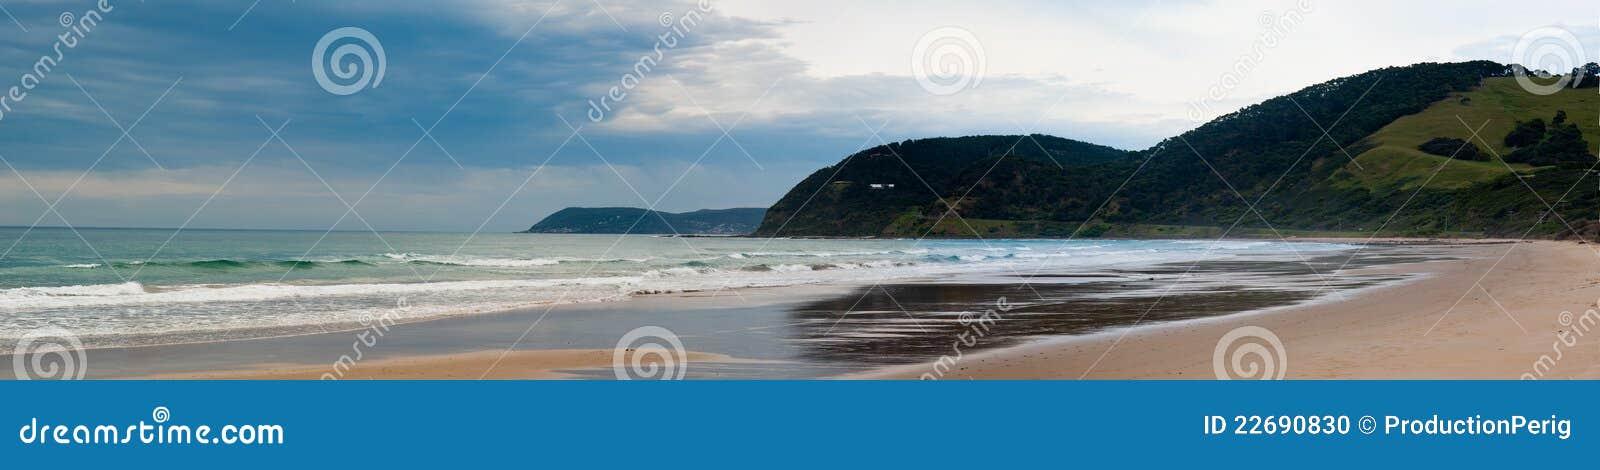 Torquay-Strand - Australien